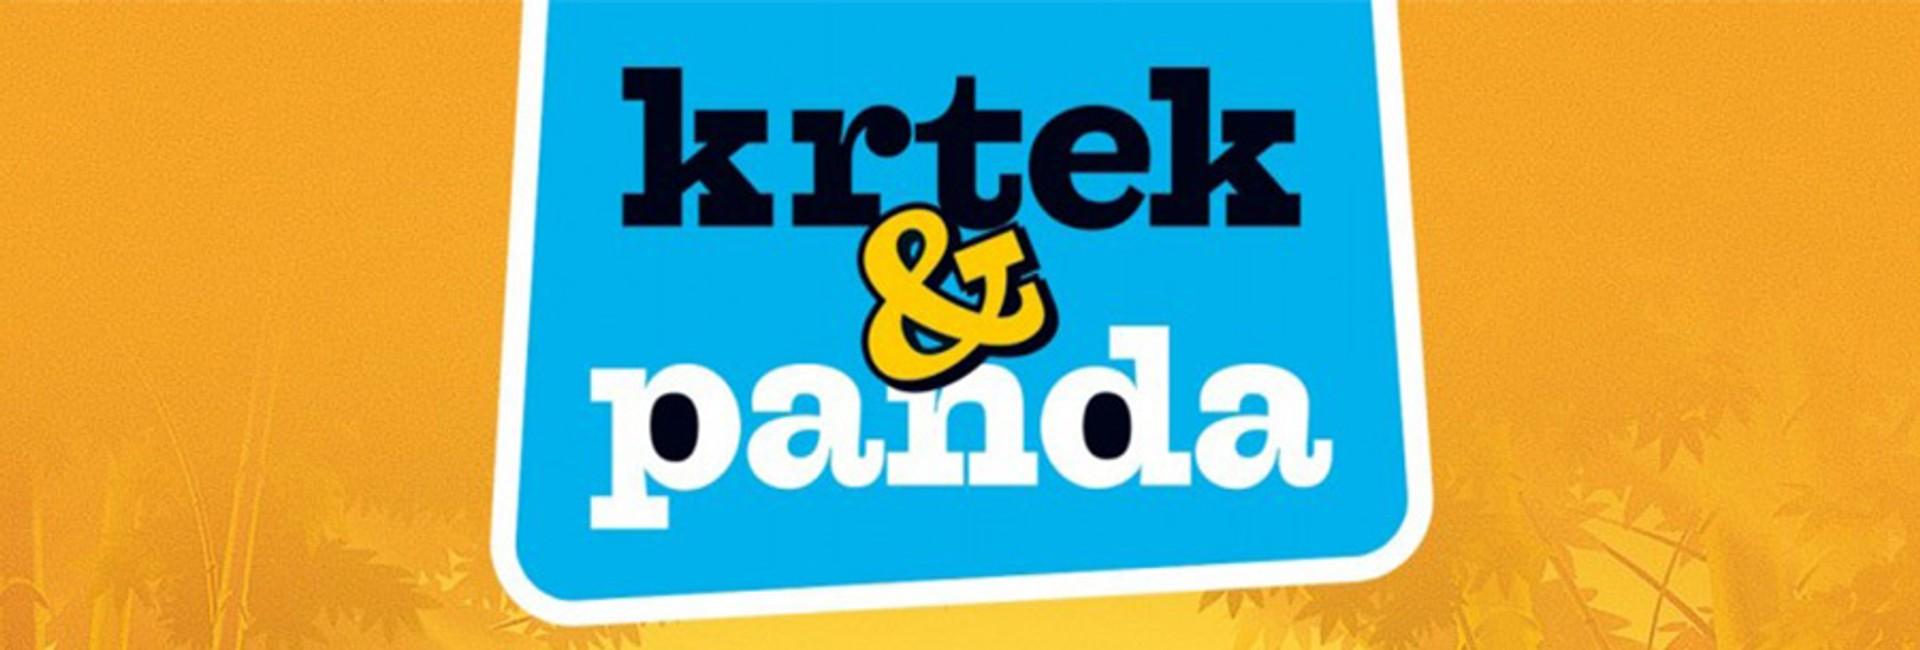 Krtko a panda